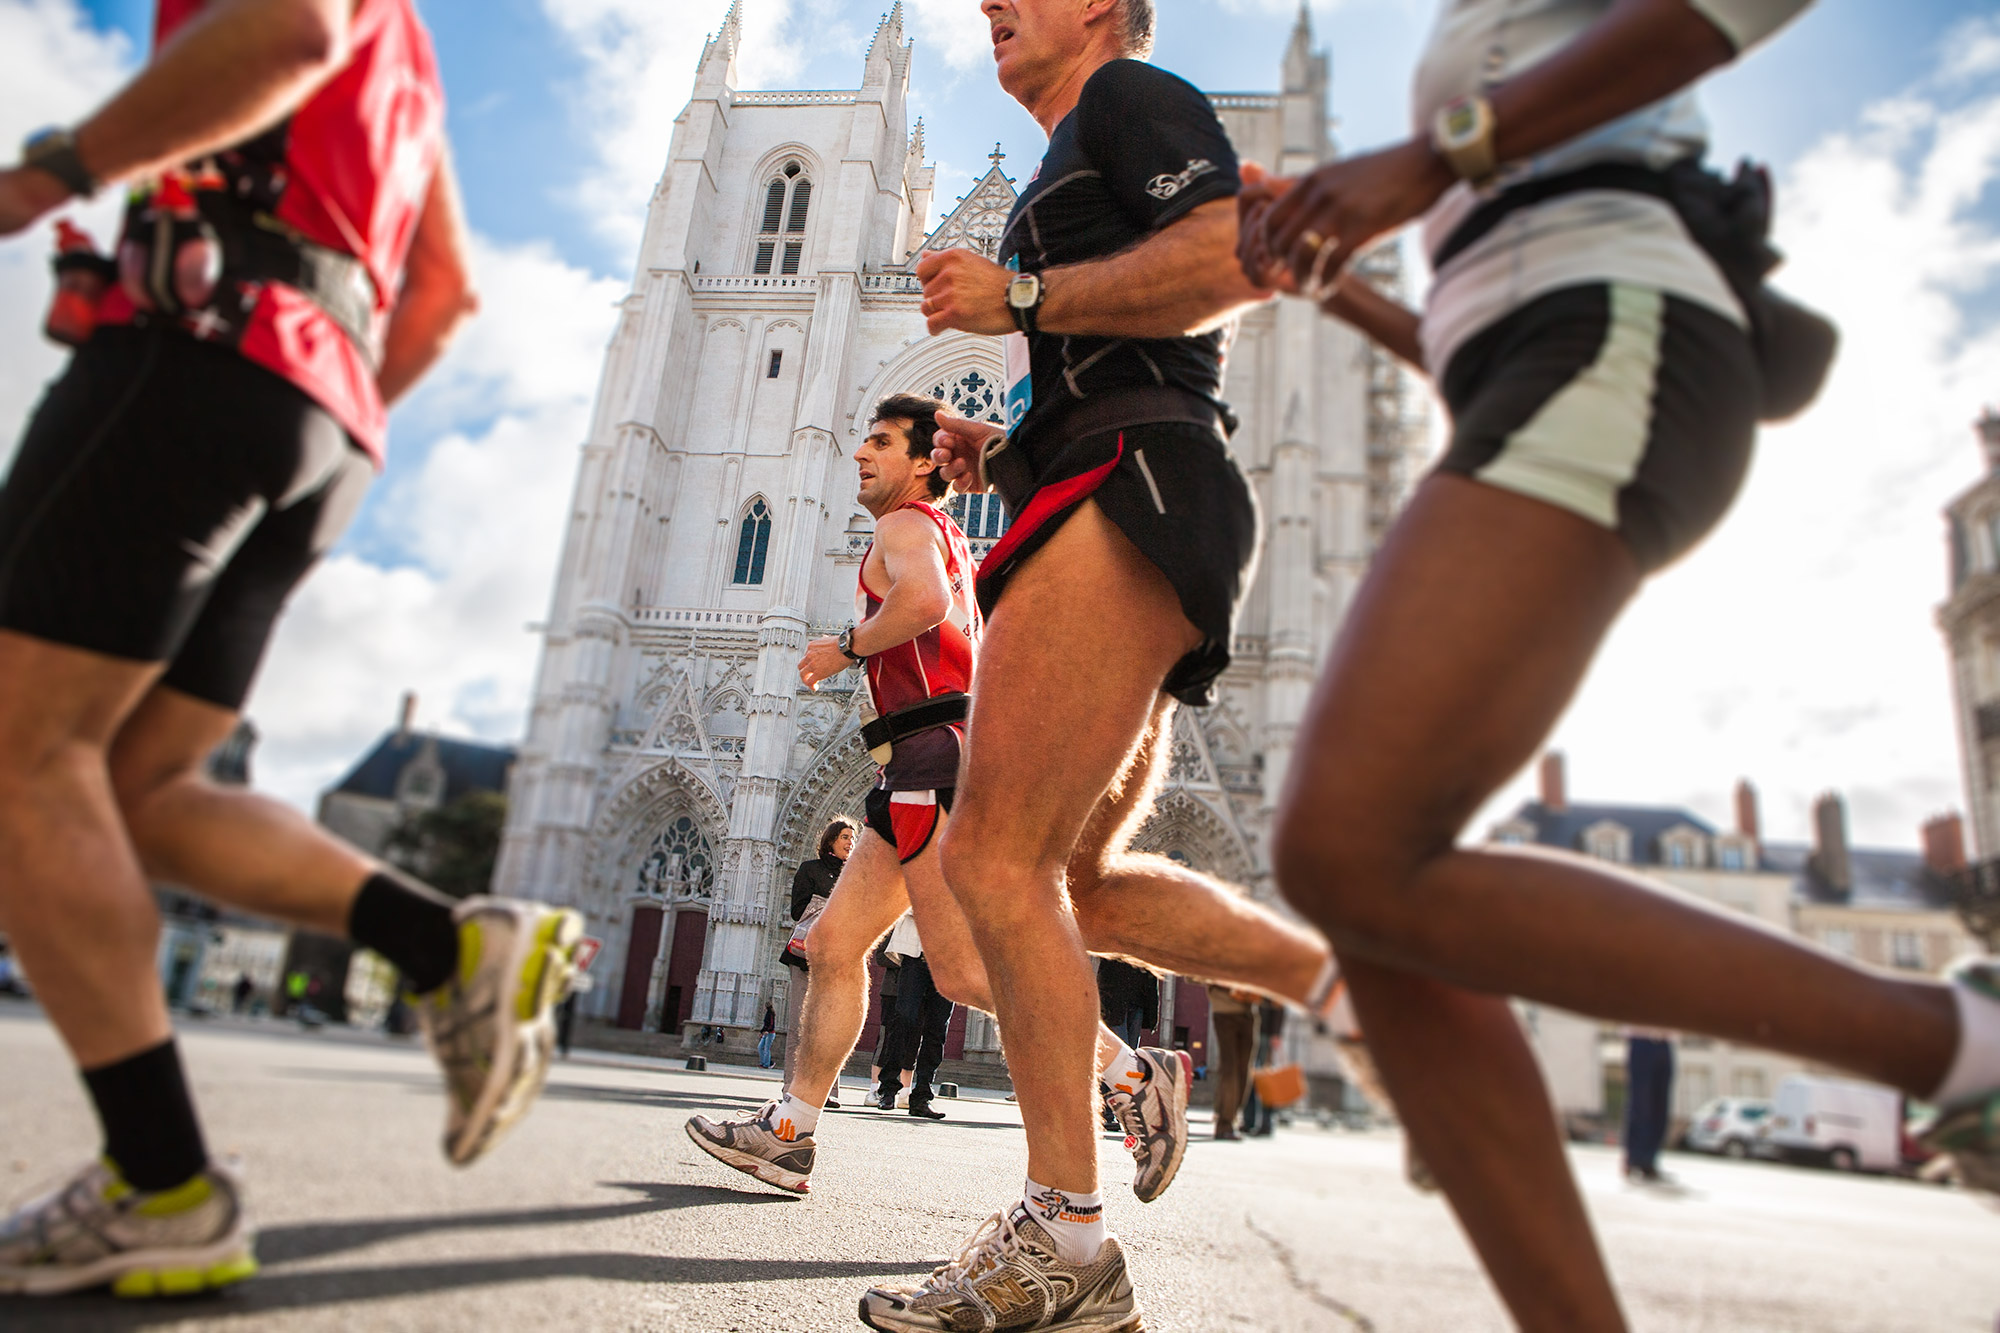 REPORTAGE-Marathon-de-Nantes.jpg